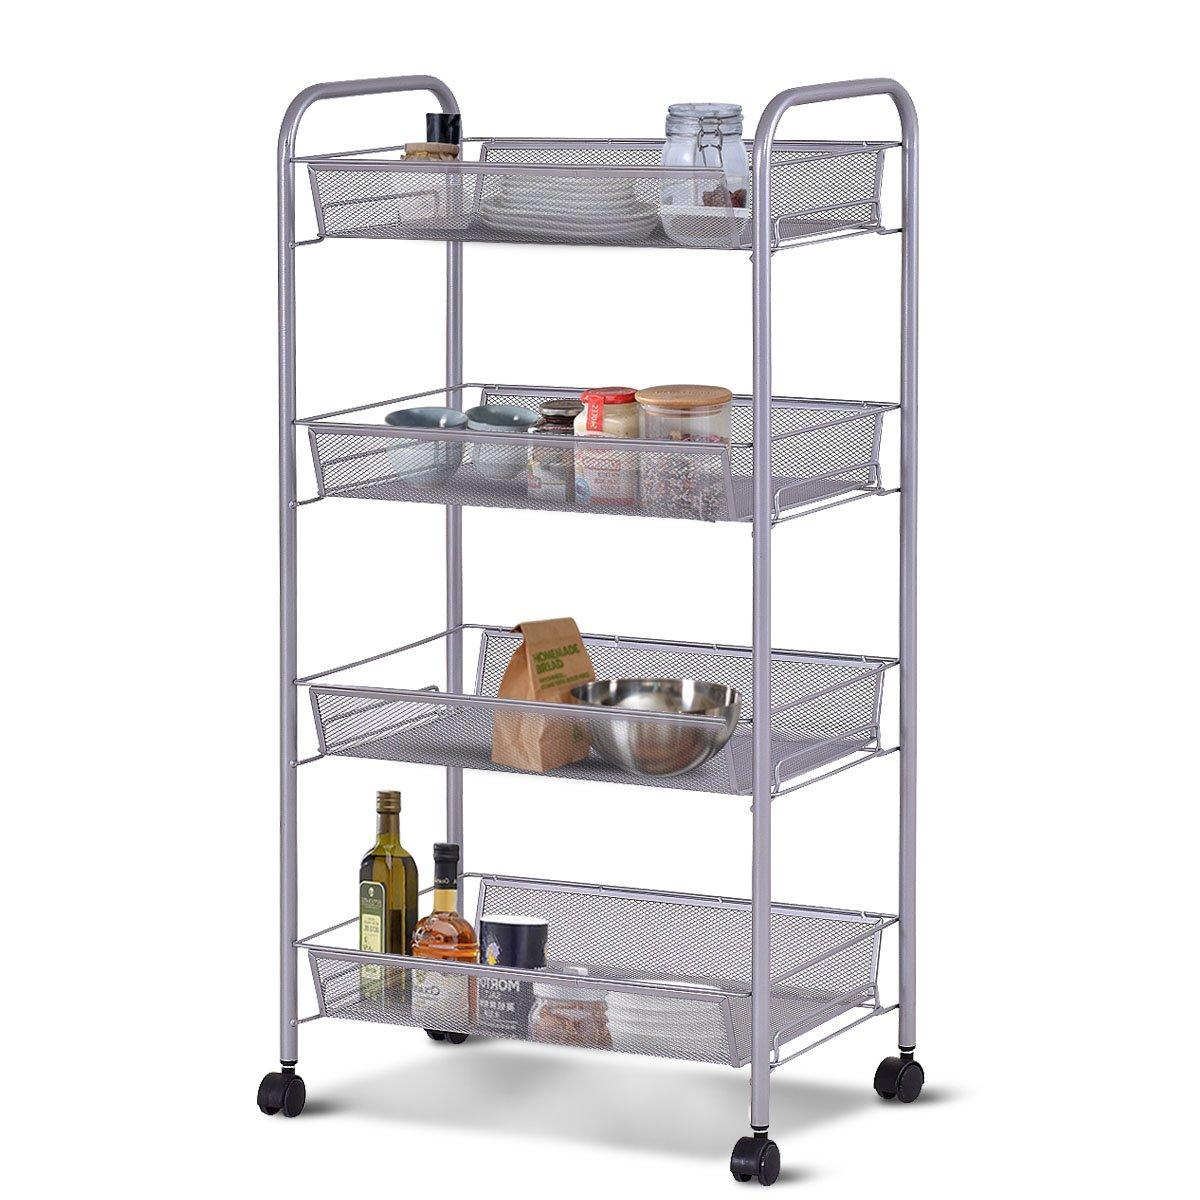 Giantex Storage Rack Trolley Cart Home Kitchen Organizer Utility Baskets (4 Tier, Silver)